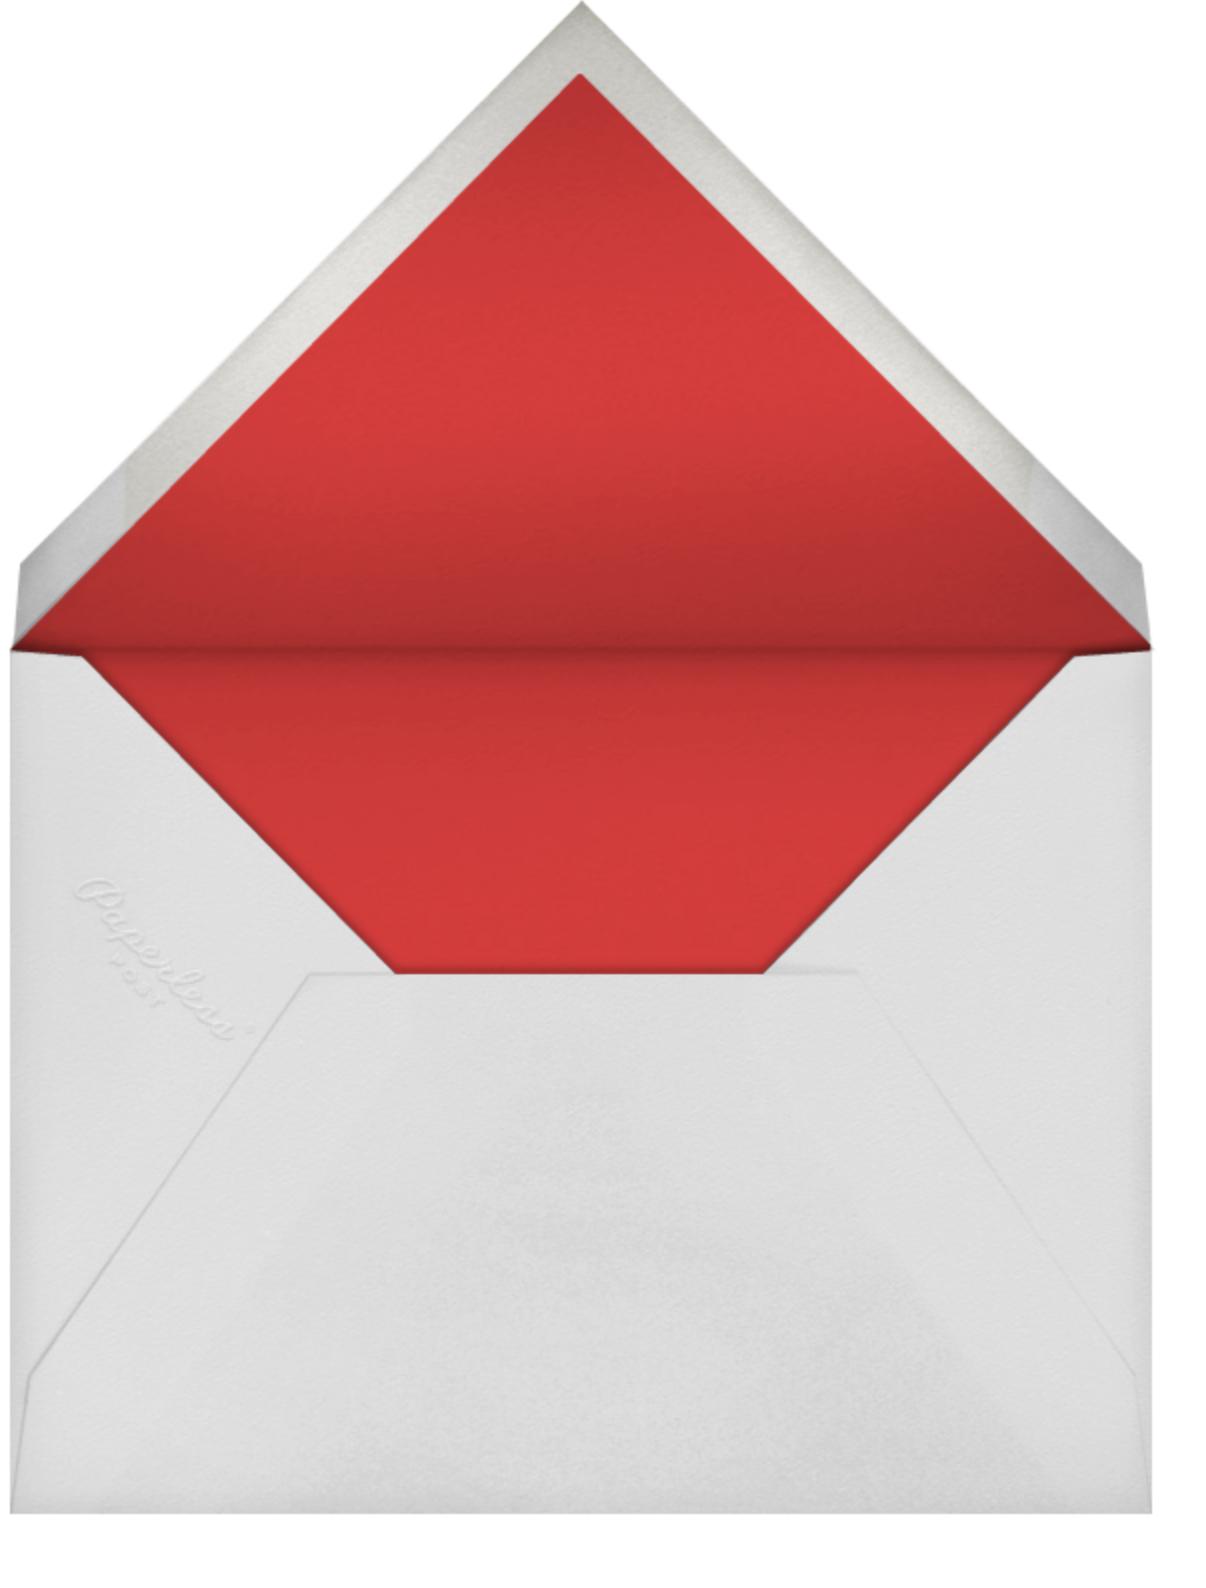 Radiant Swirls (Square) - Gold - Oscar de la Renta - Adult birthday - envelope back